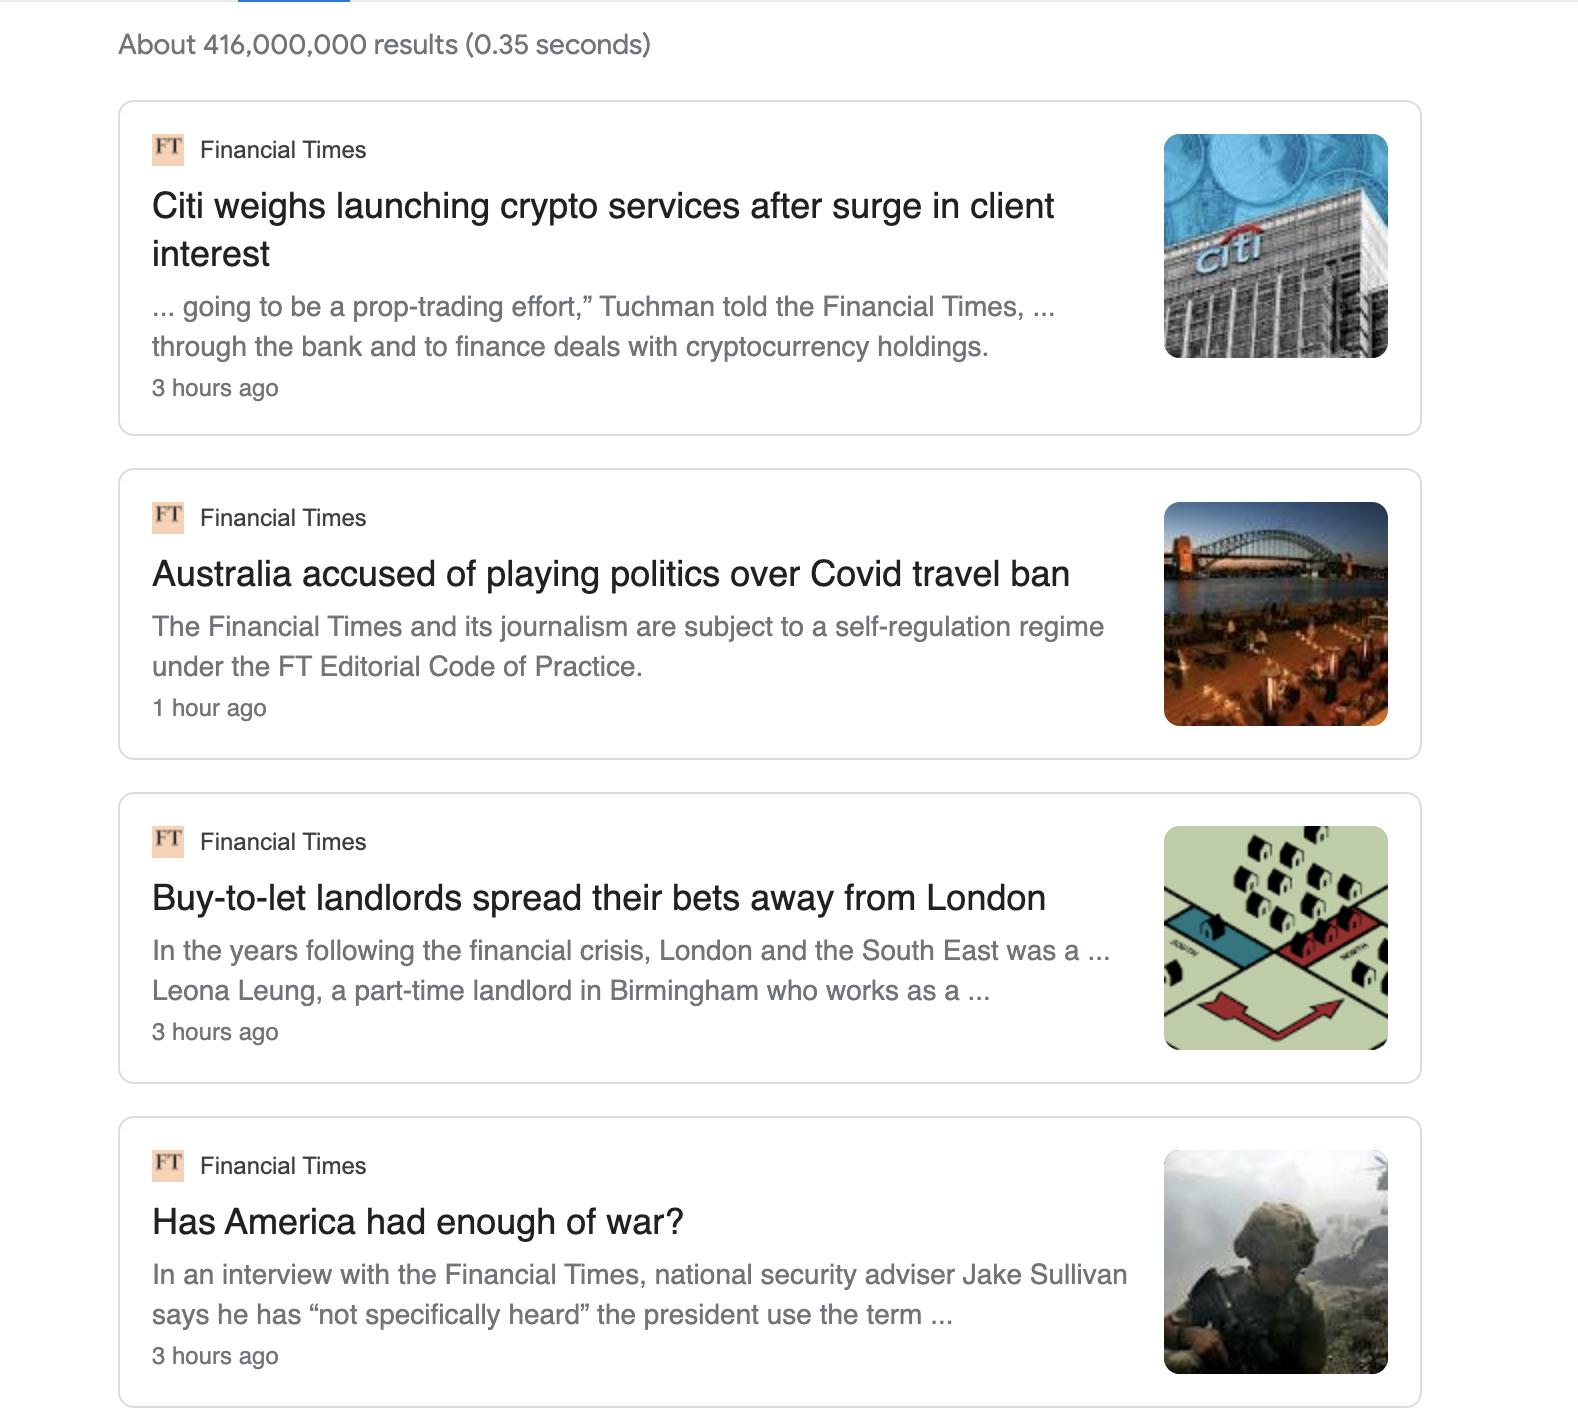 Financial Times Google News